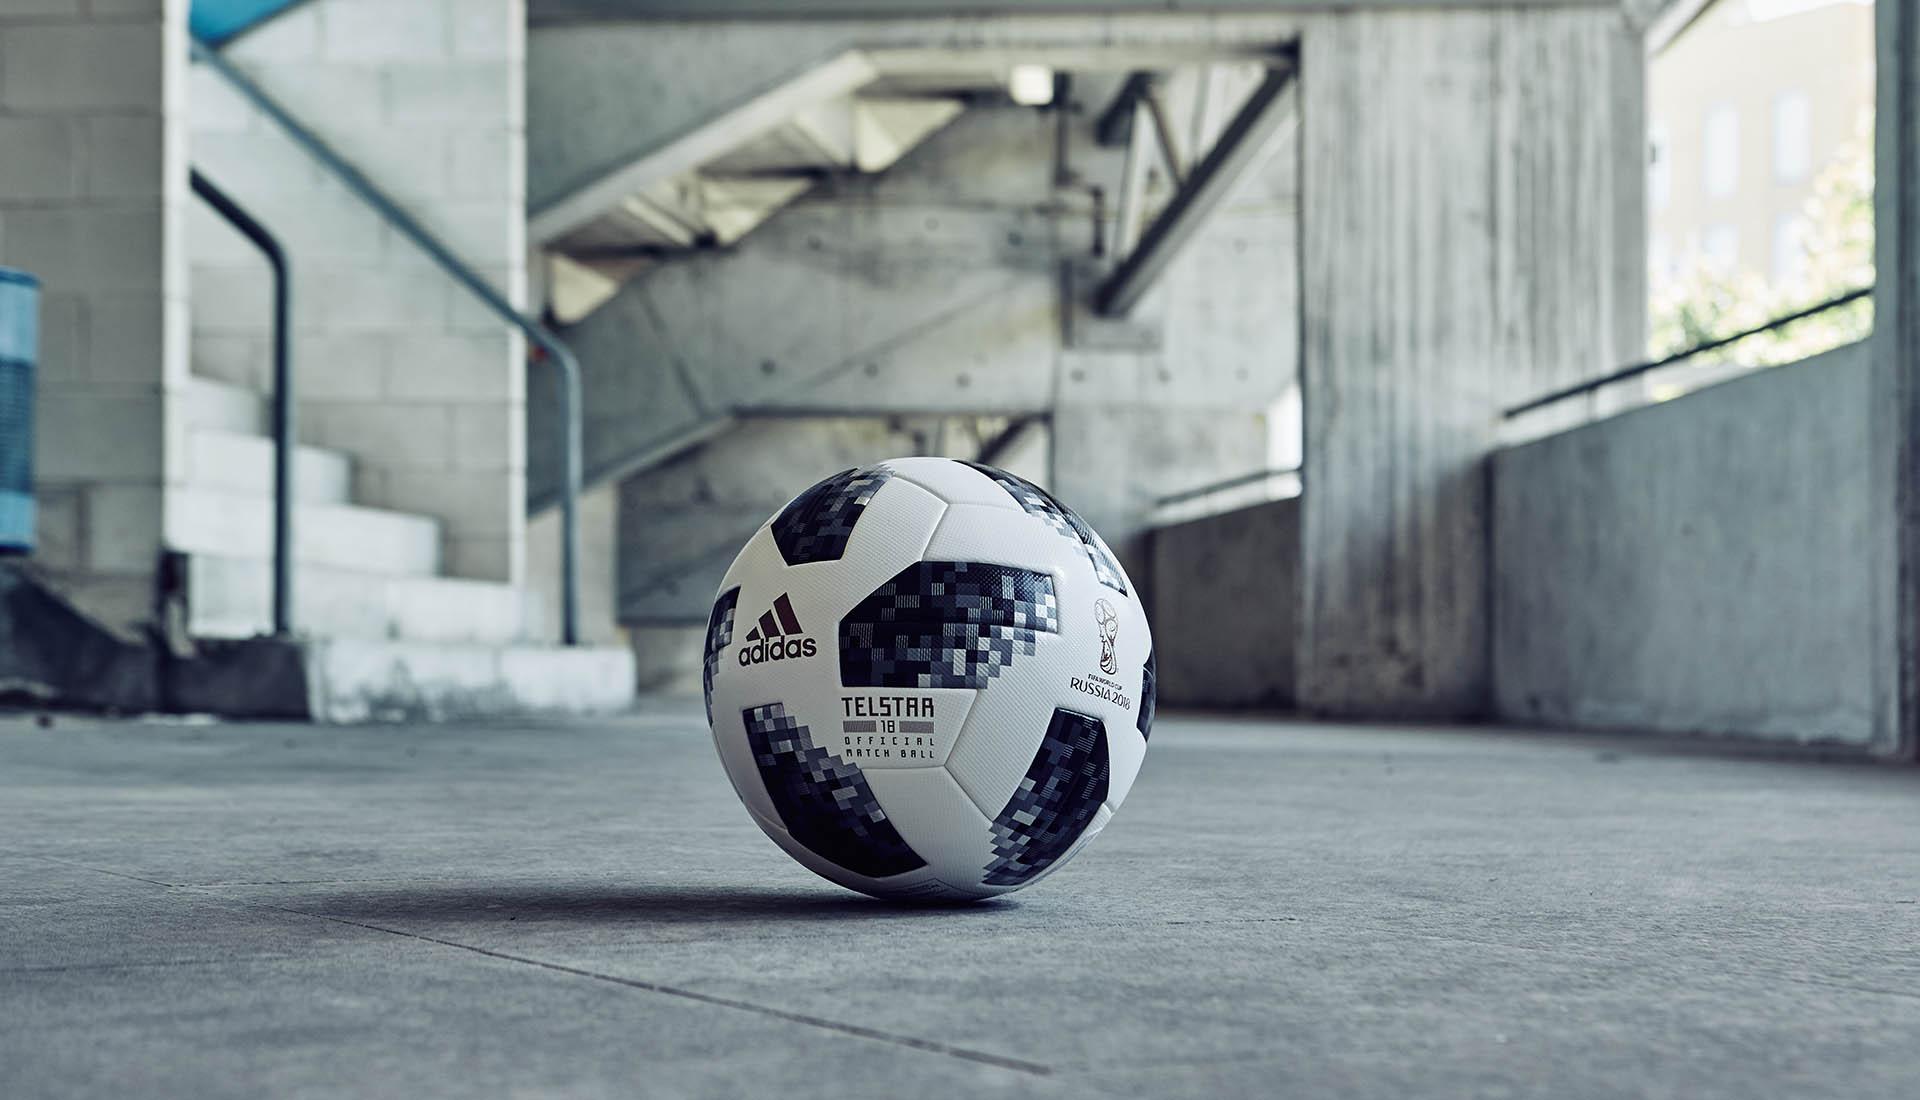 world-cup-match-ball-adidas-soccerbible_0000__fg_1956